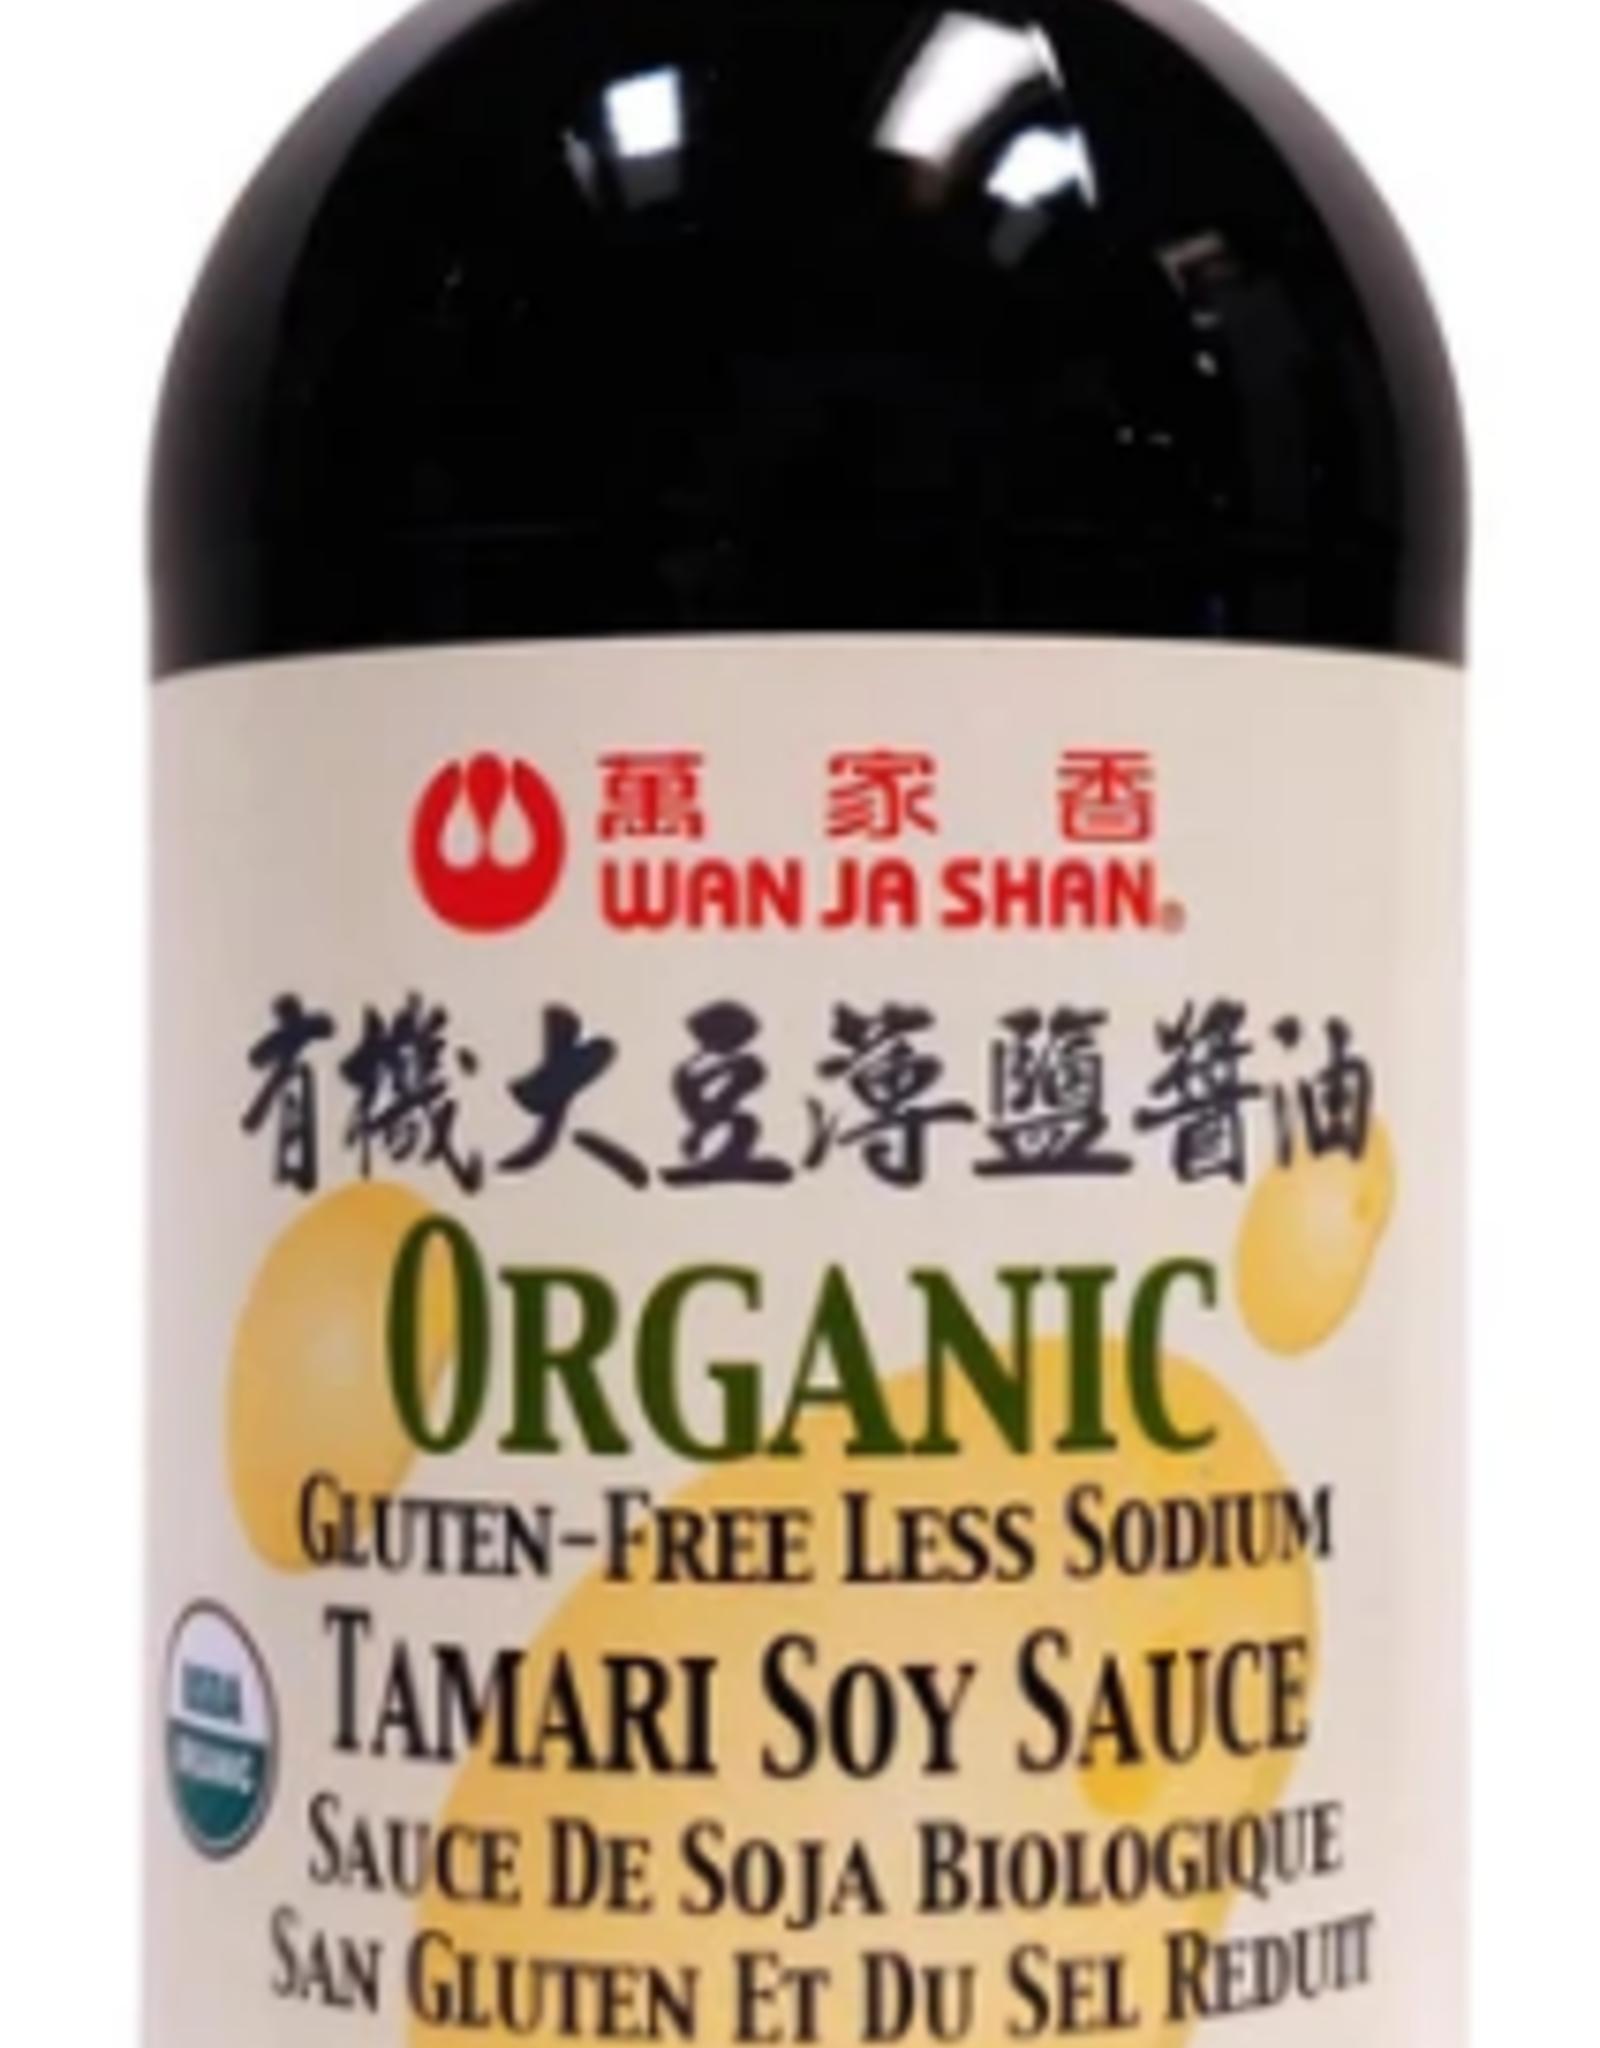 (LW) Vegan Organic Gluten-Free Less Sodium Tamari Soy Sauce*(萬家香) 有機大豆薄鹽醬油